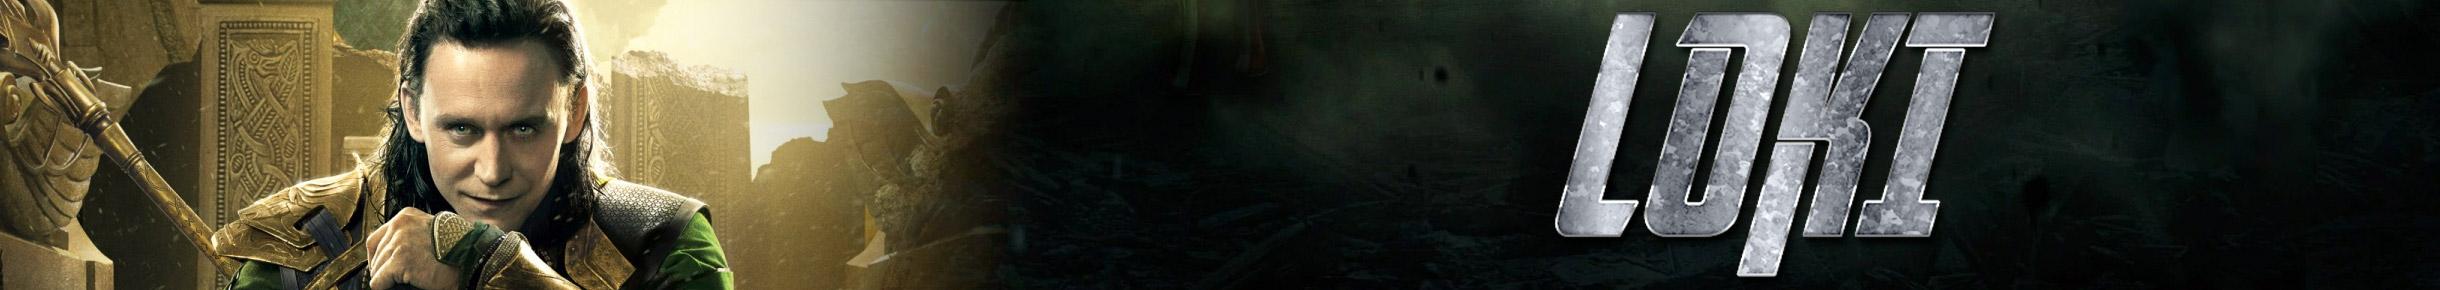 Loki Glasses & Mugs Banner